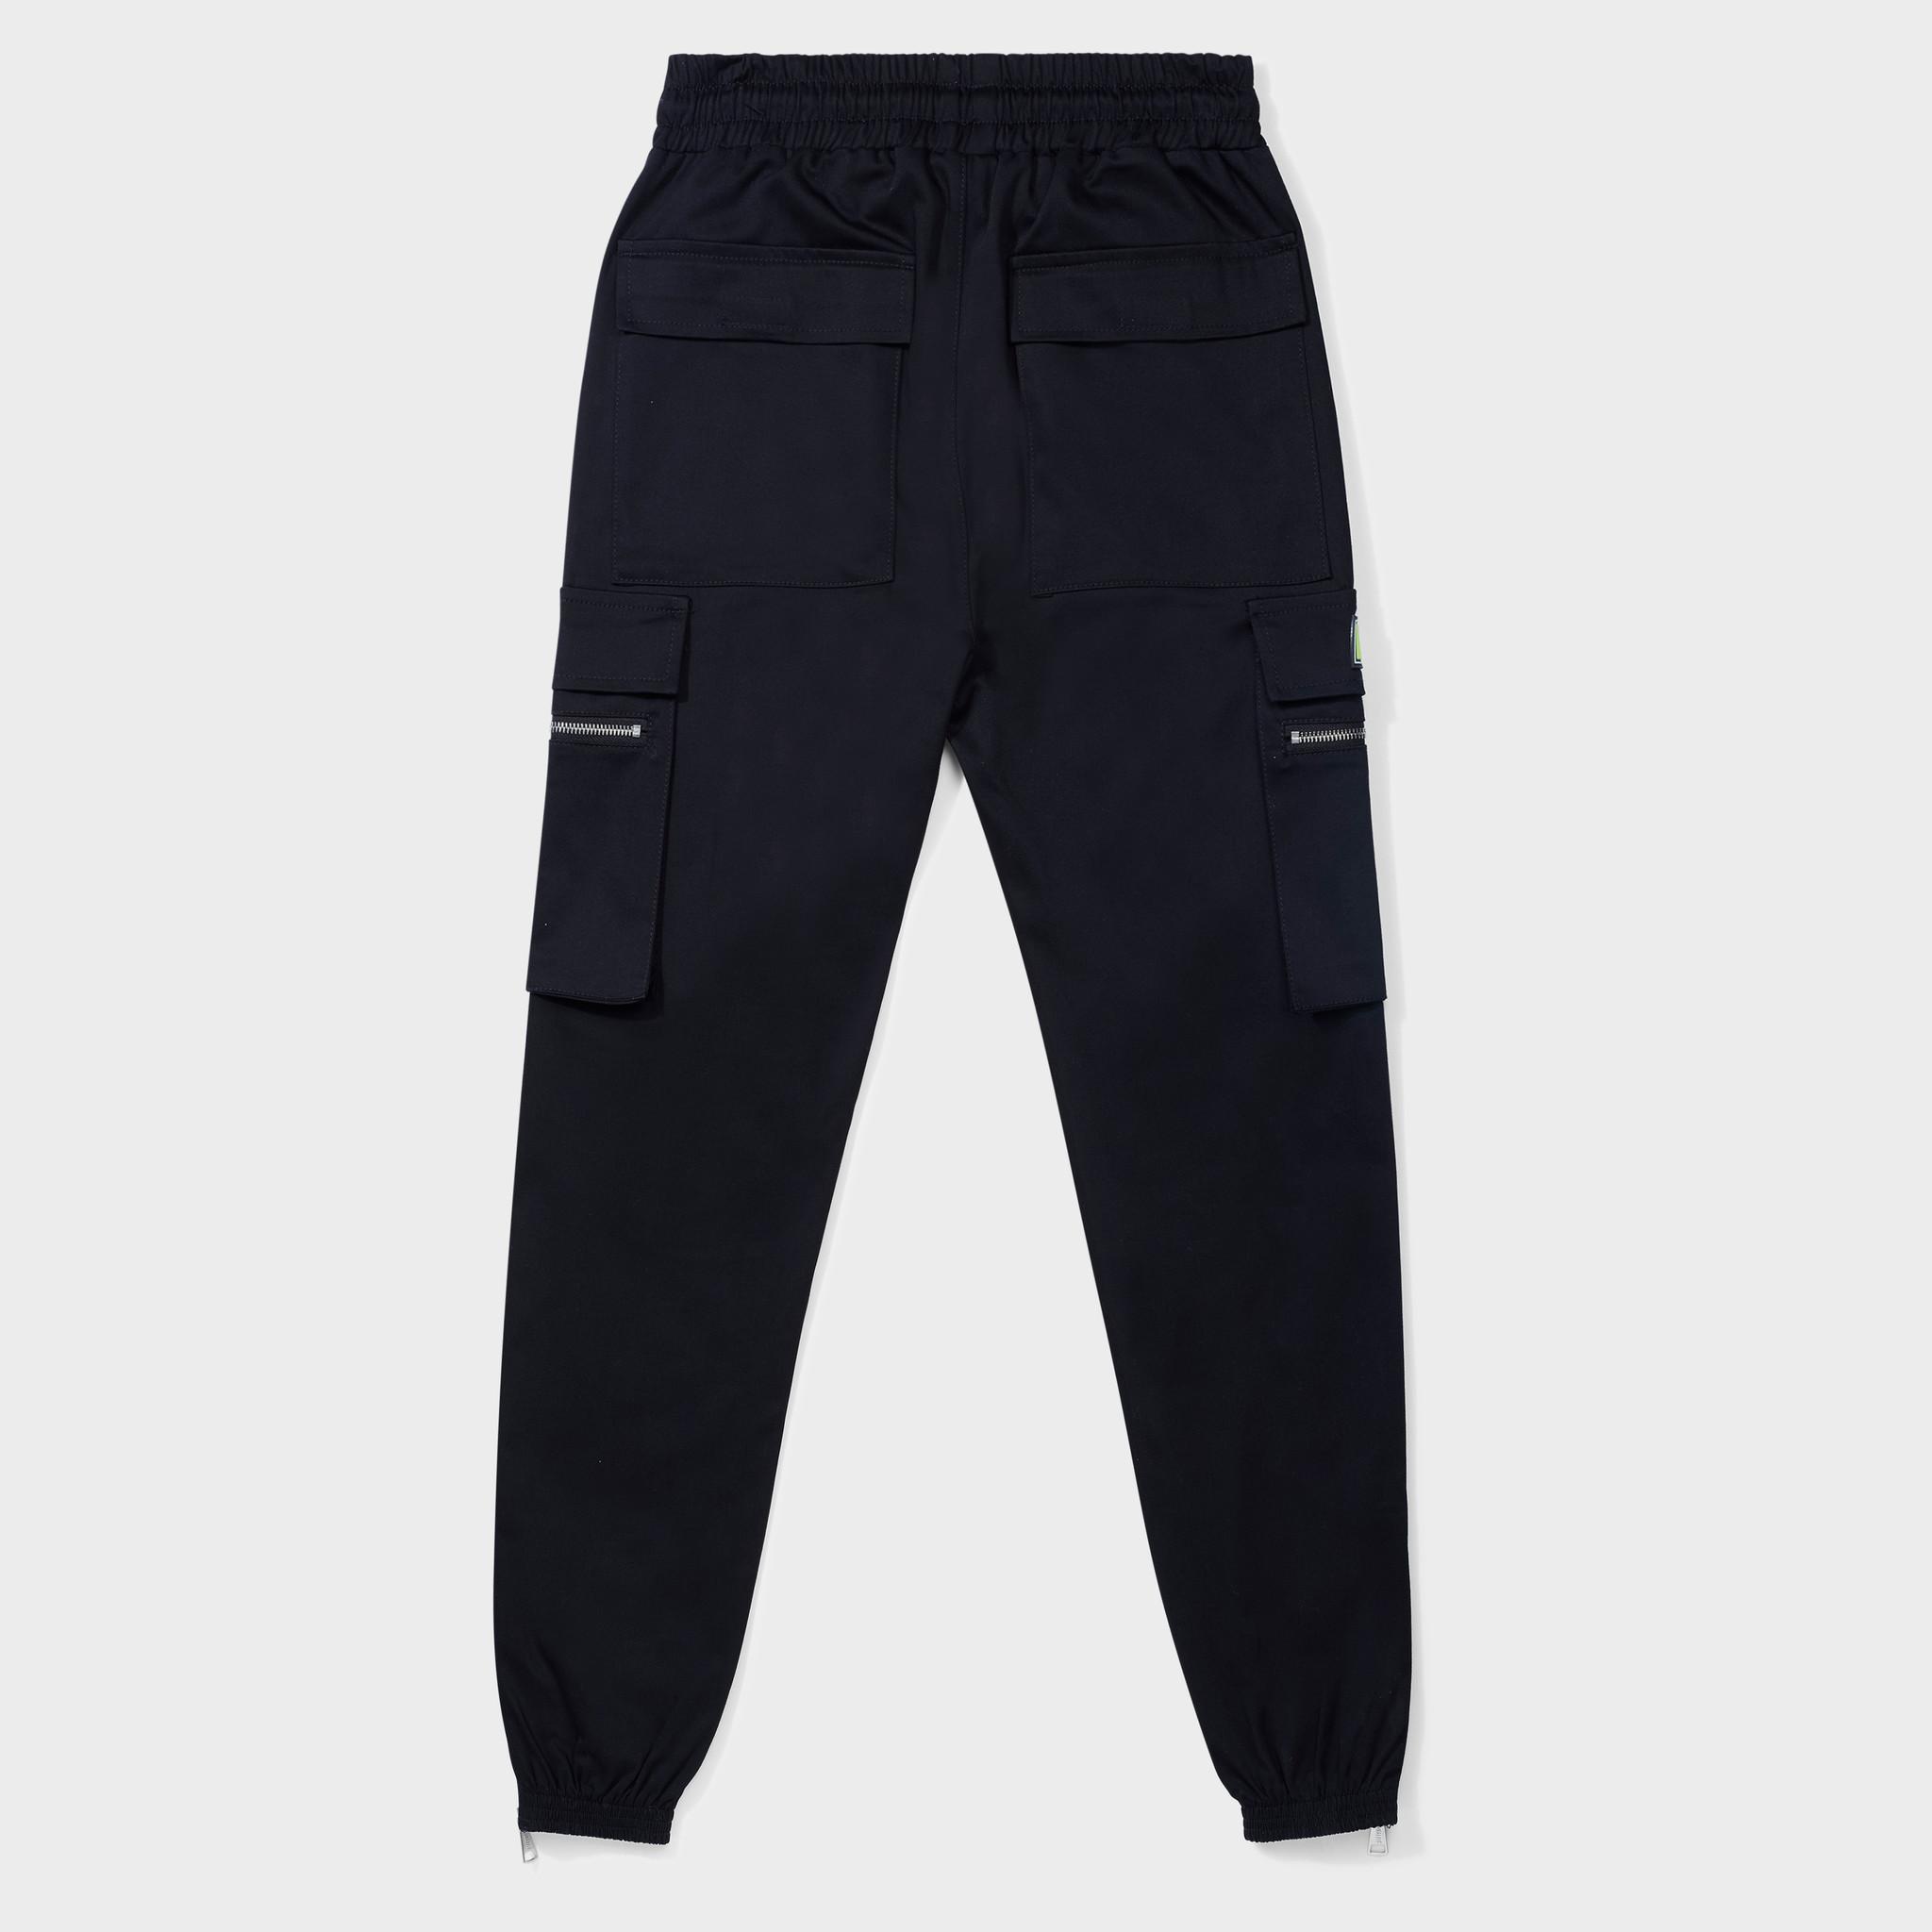 FUTURE CARGO PANTS BLACK-2